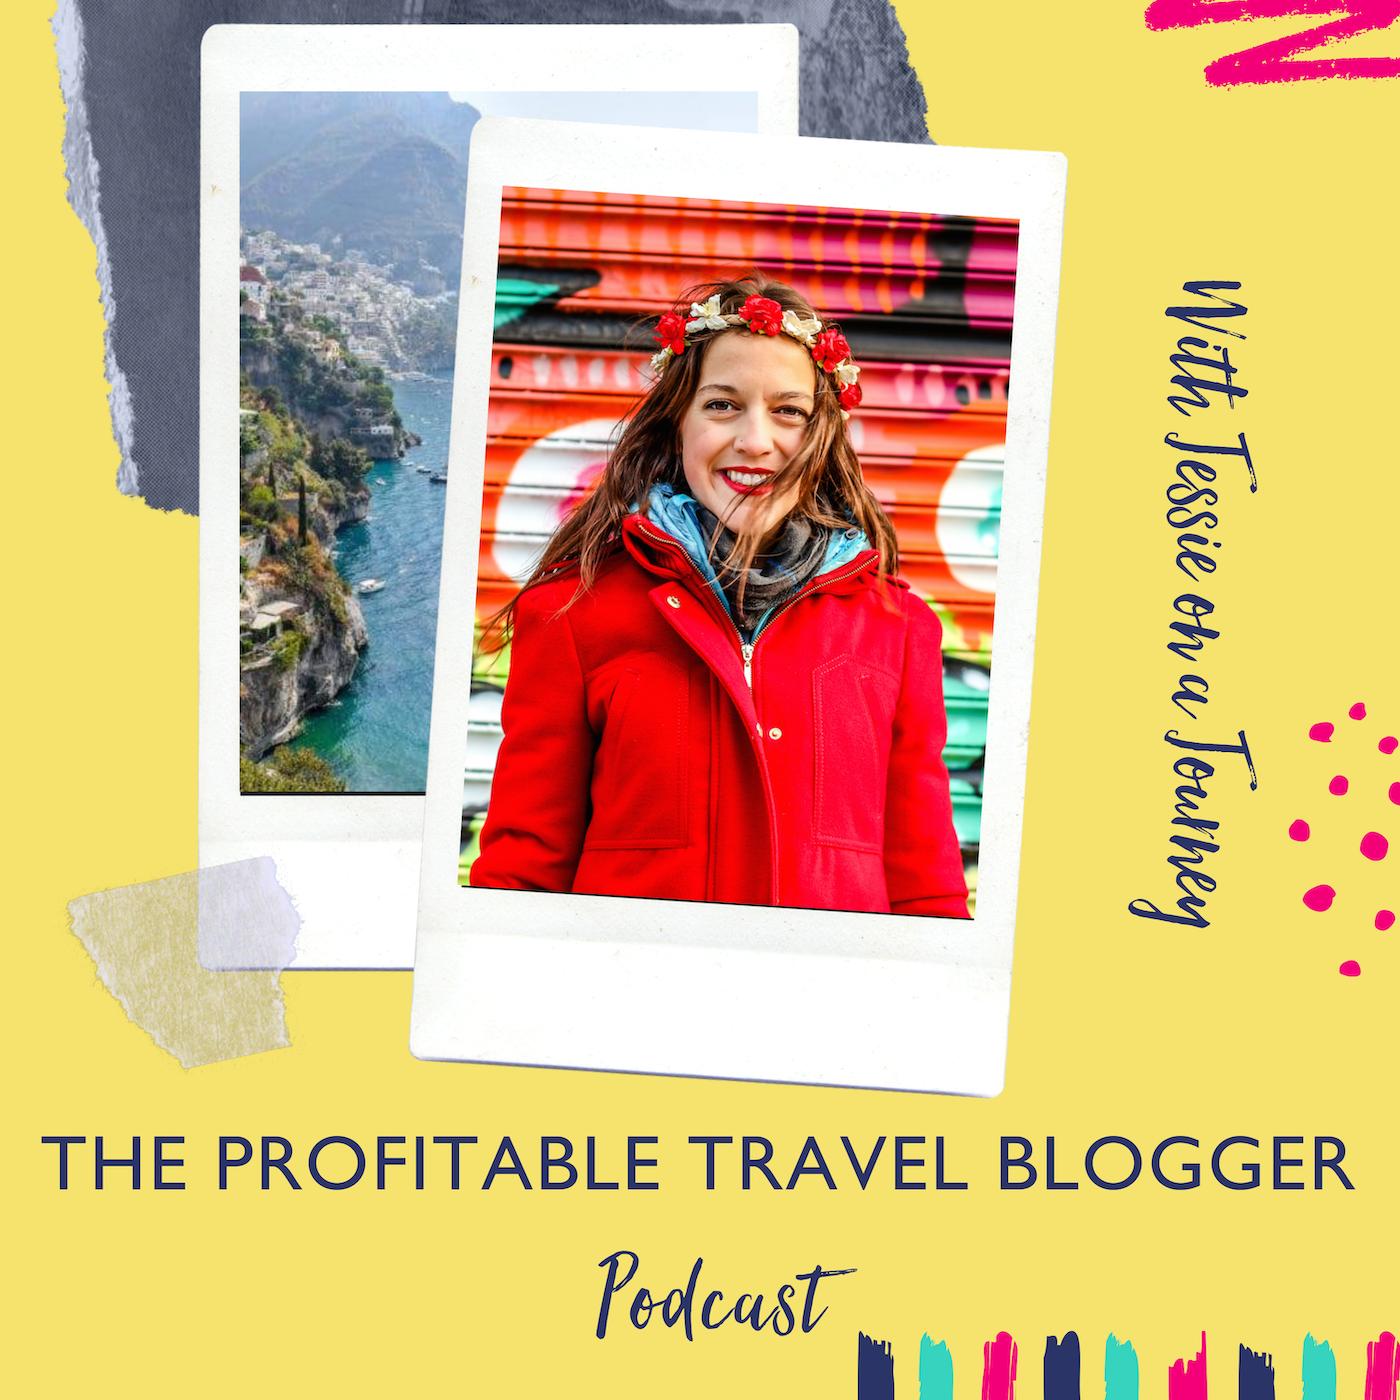 The Profitable Travel Blogger Podcast show art